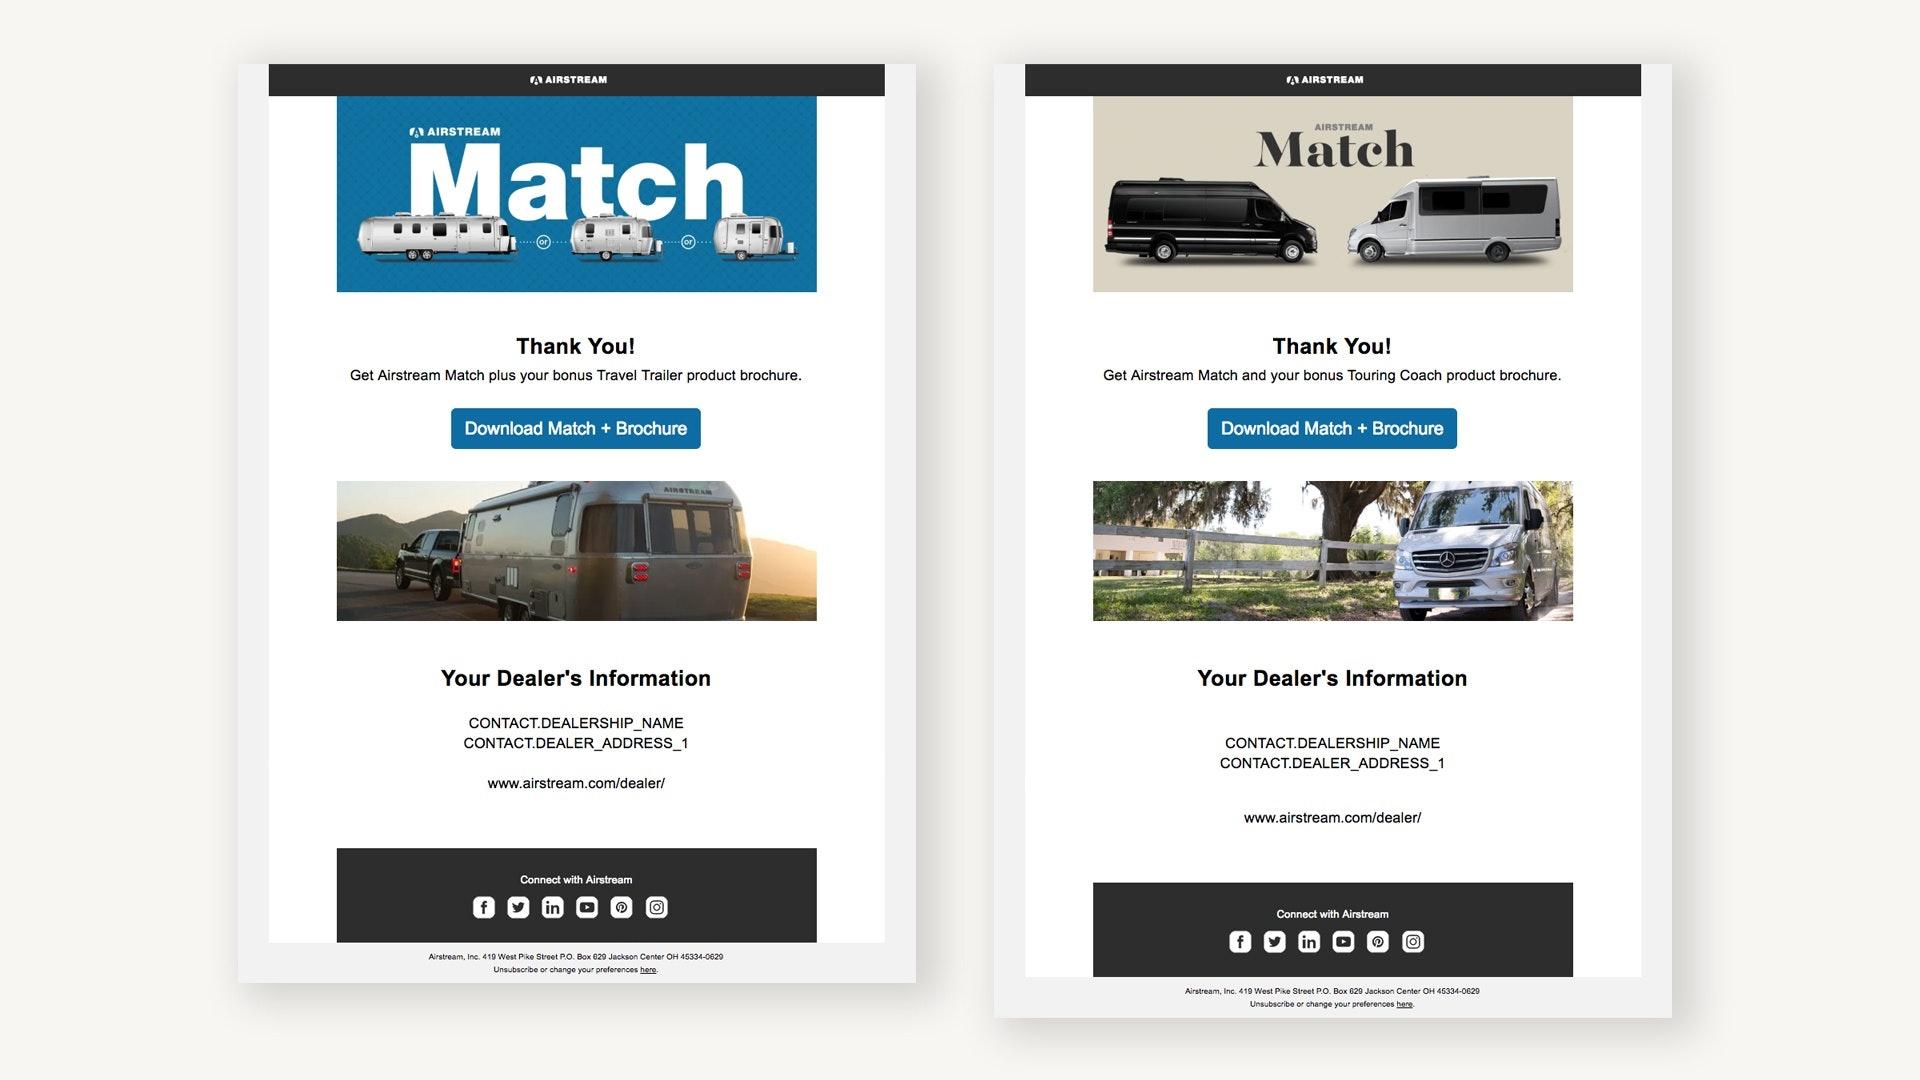 Airstream Lead Nurturing Email Examples